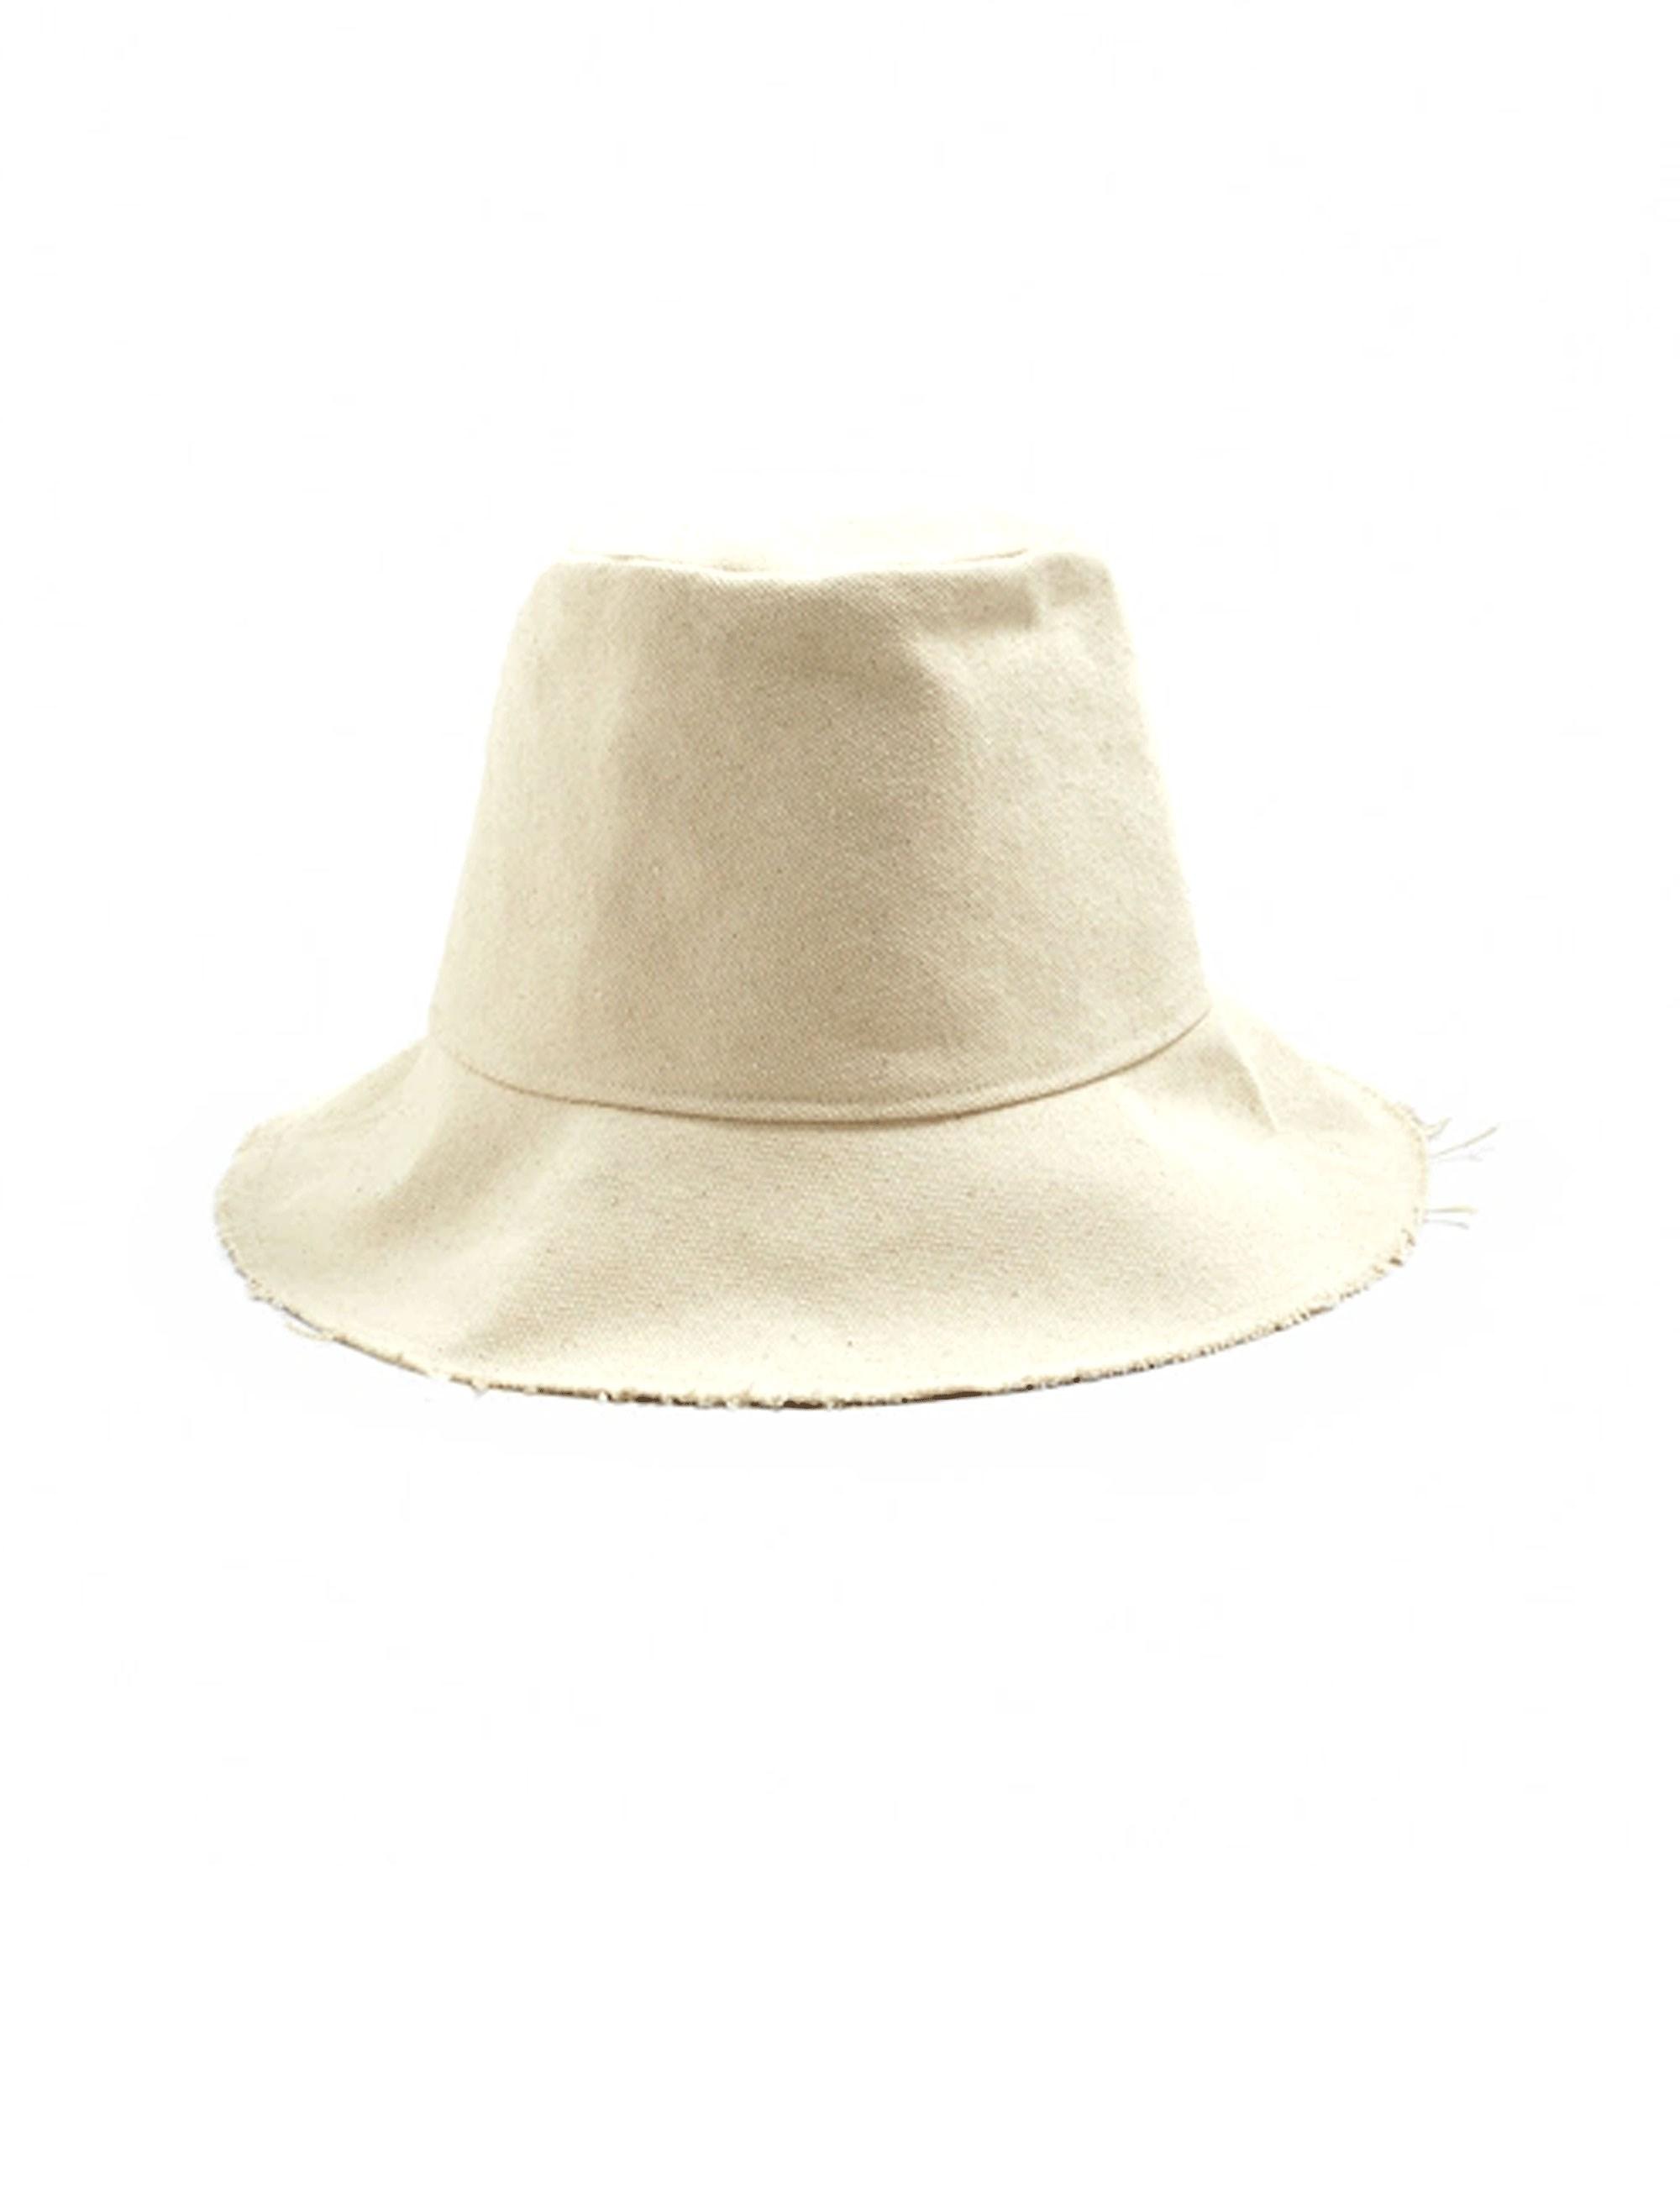 قیمت کلاه نخی زنانه - مانگو